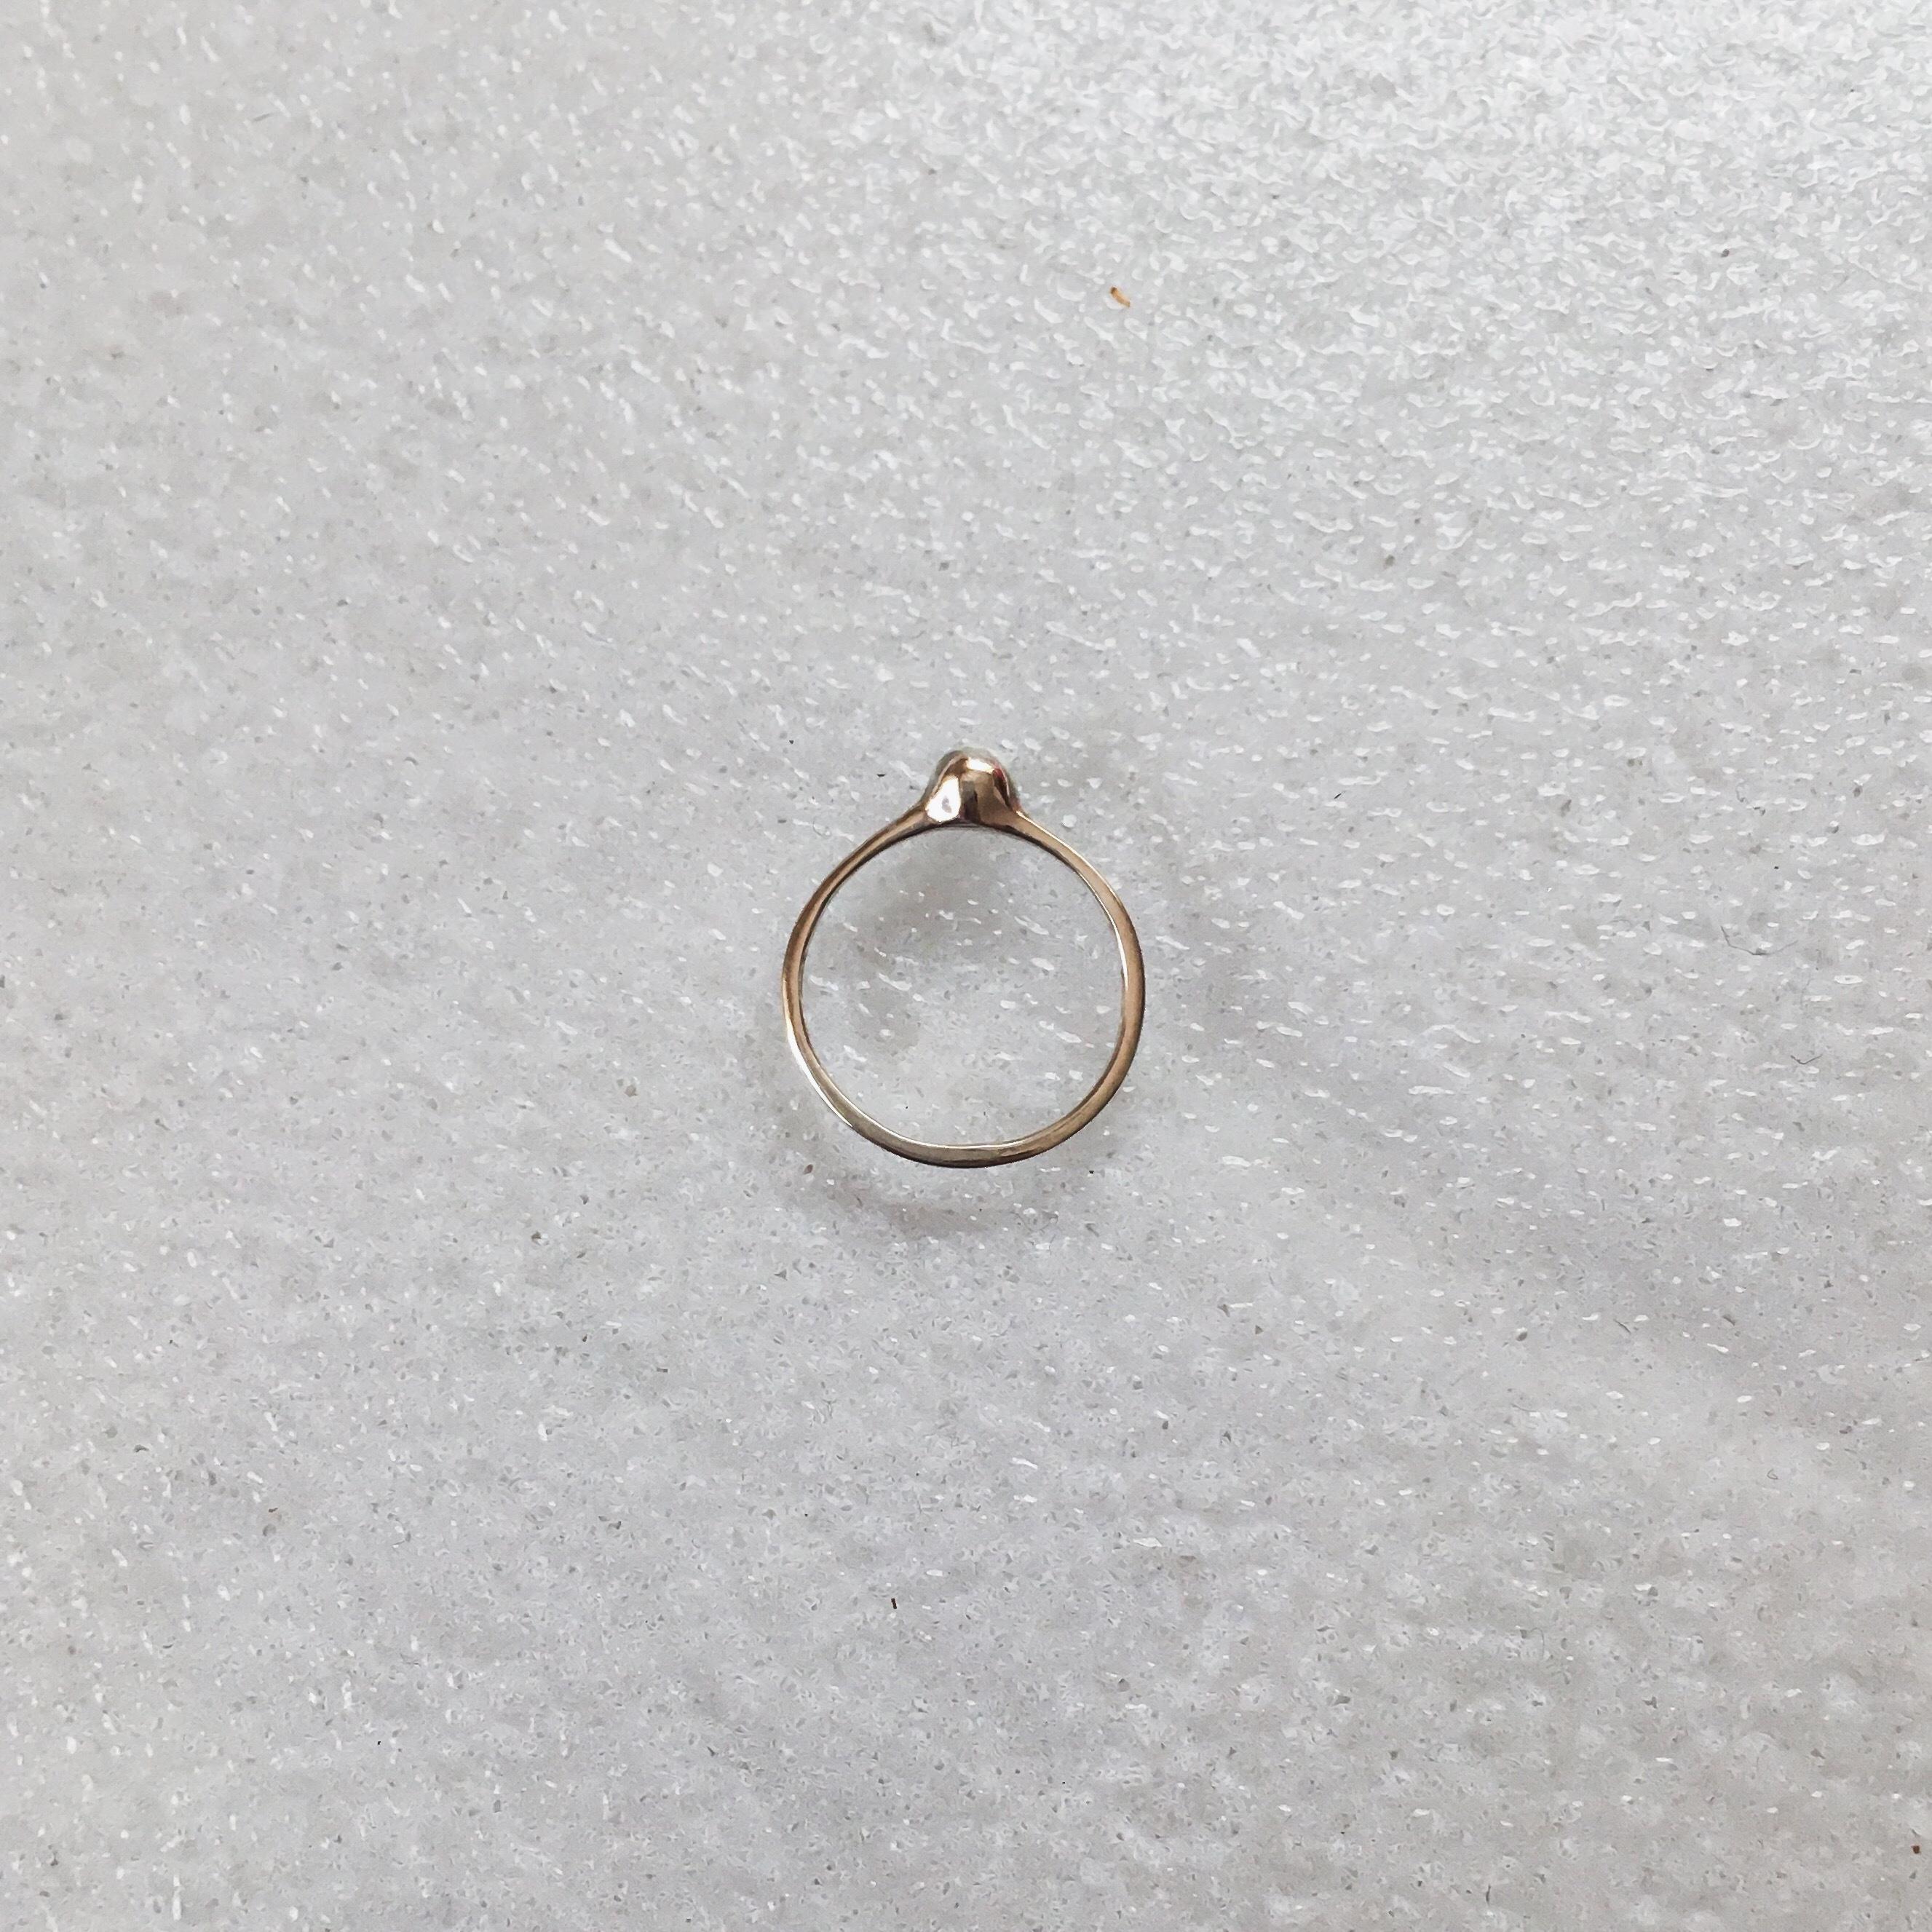 【受注生産】R-S6 silver925 pinkiering